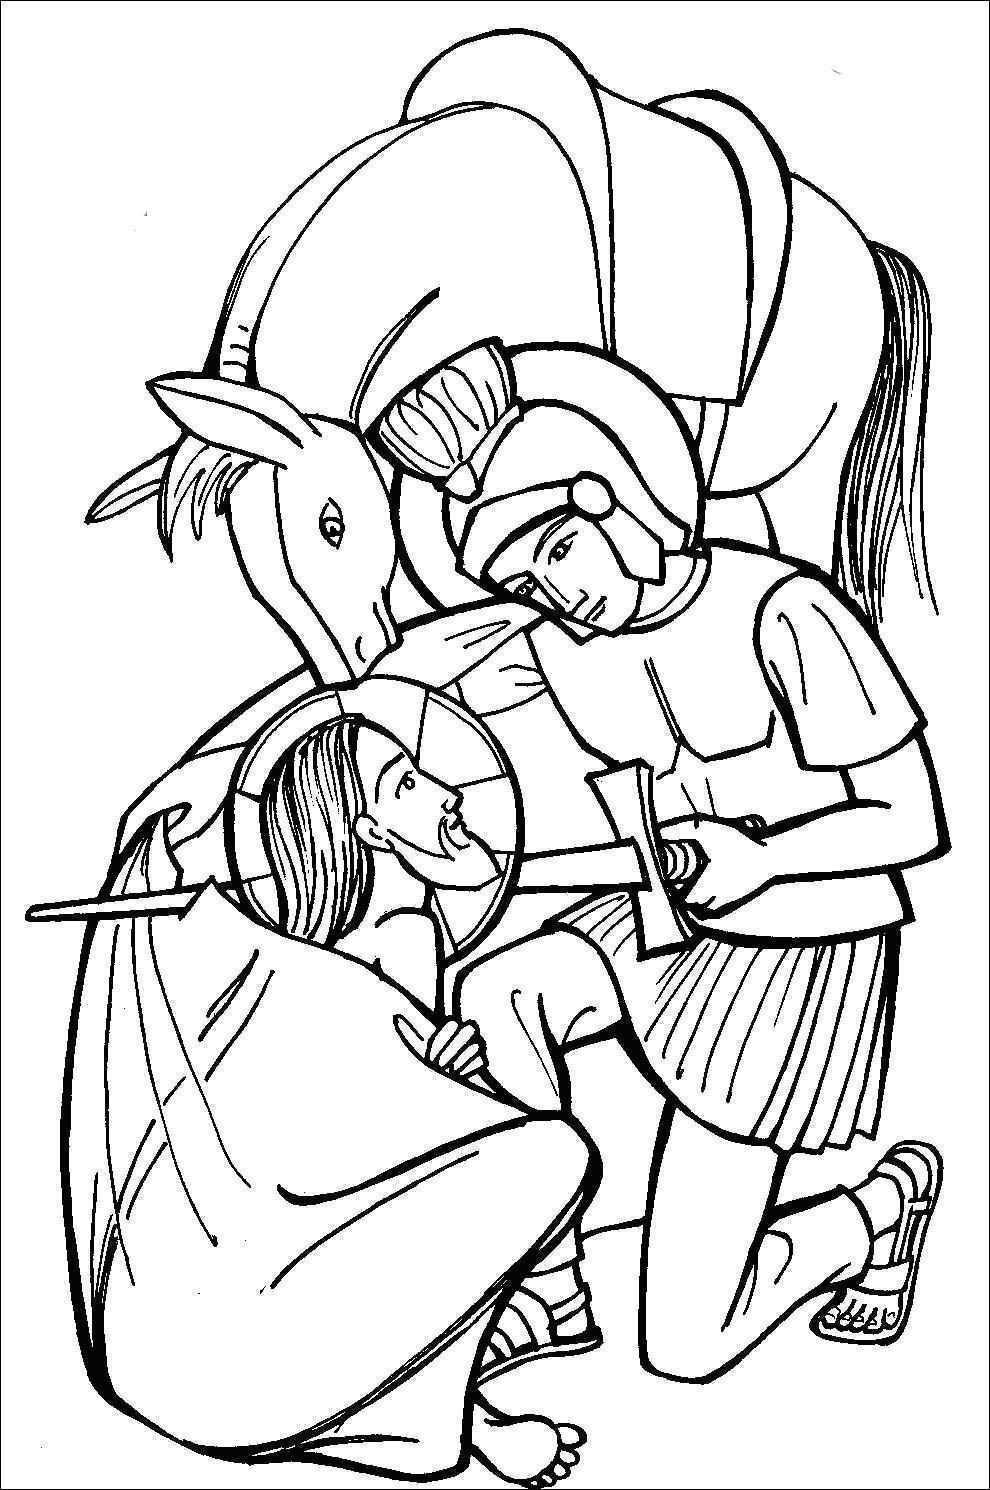 Sankt Martin Ausmalbilder Inspirierend St Martin Ausmalbilder Ideen 35 Ausmalbilder Line Scoredatscore Fotos